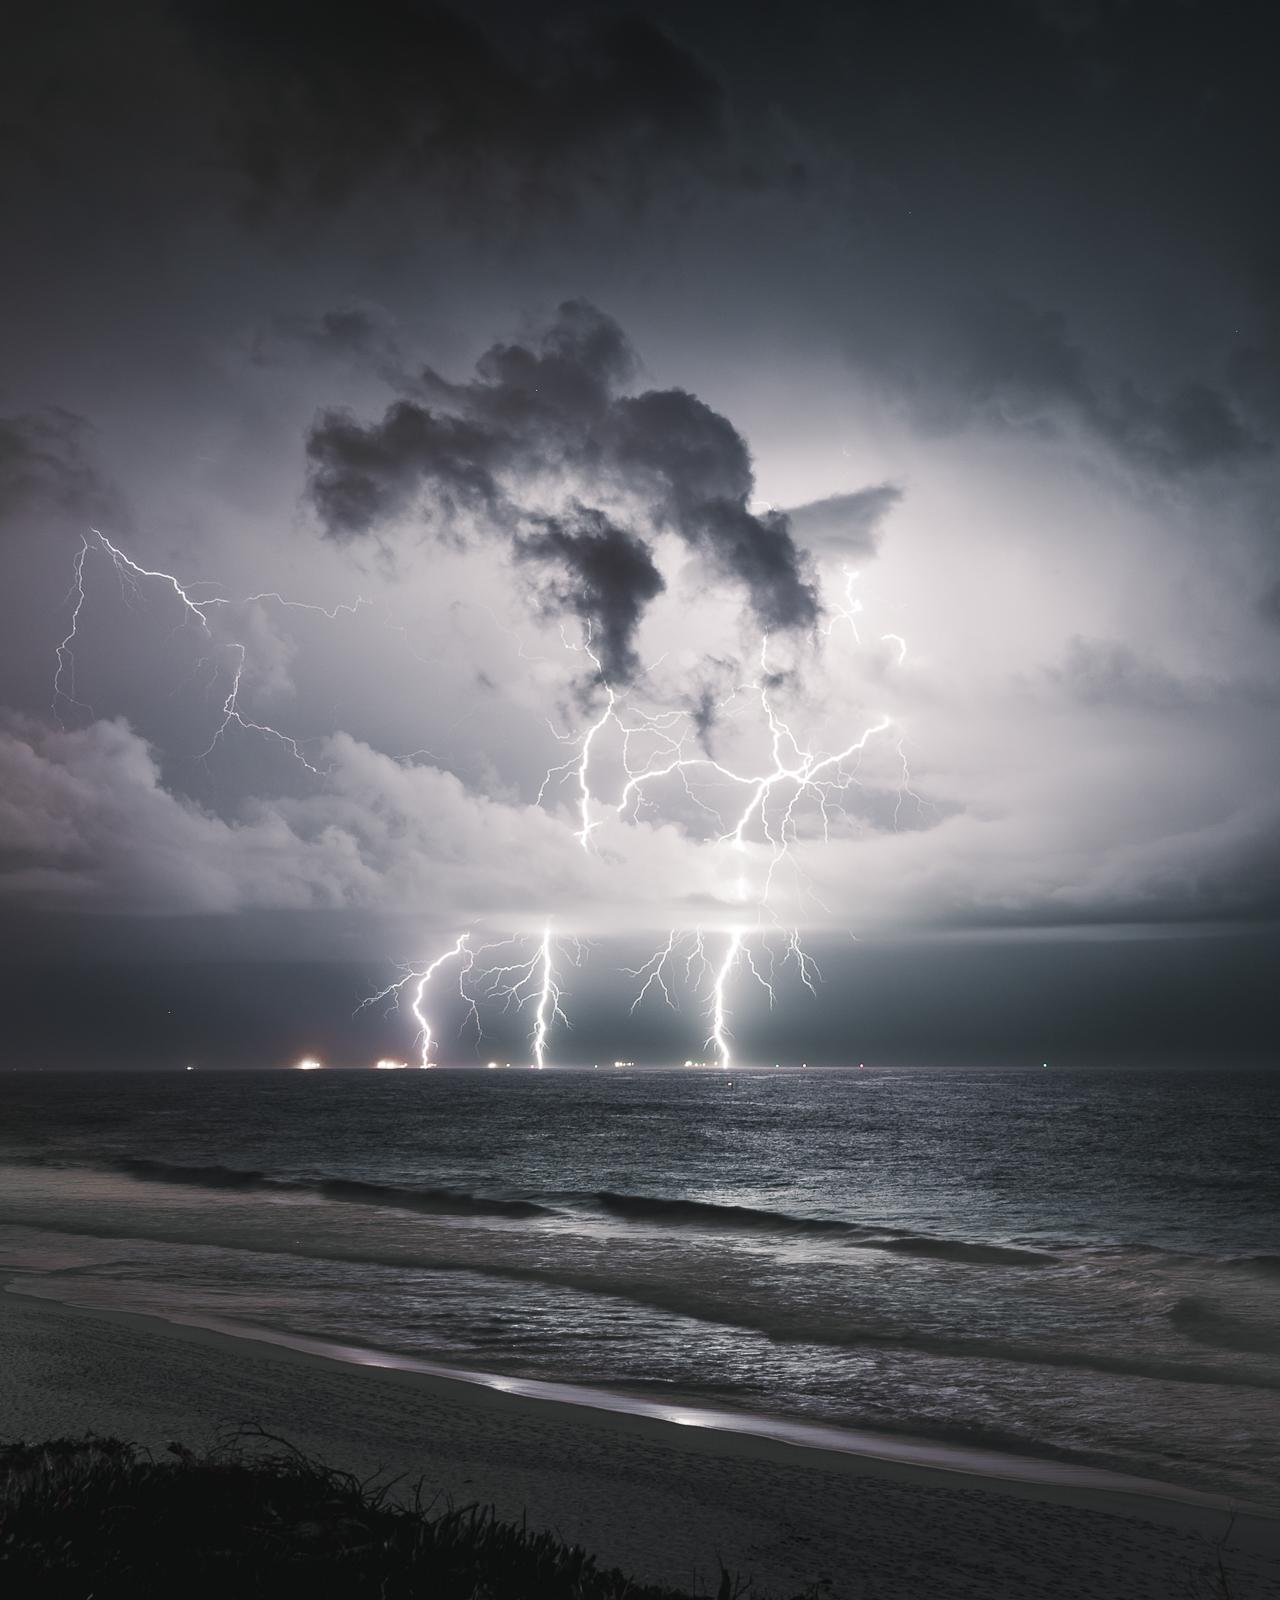 Lightning, Floreat, Western Australia